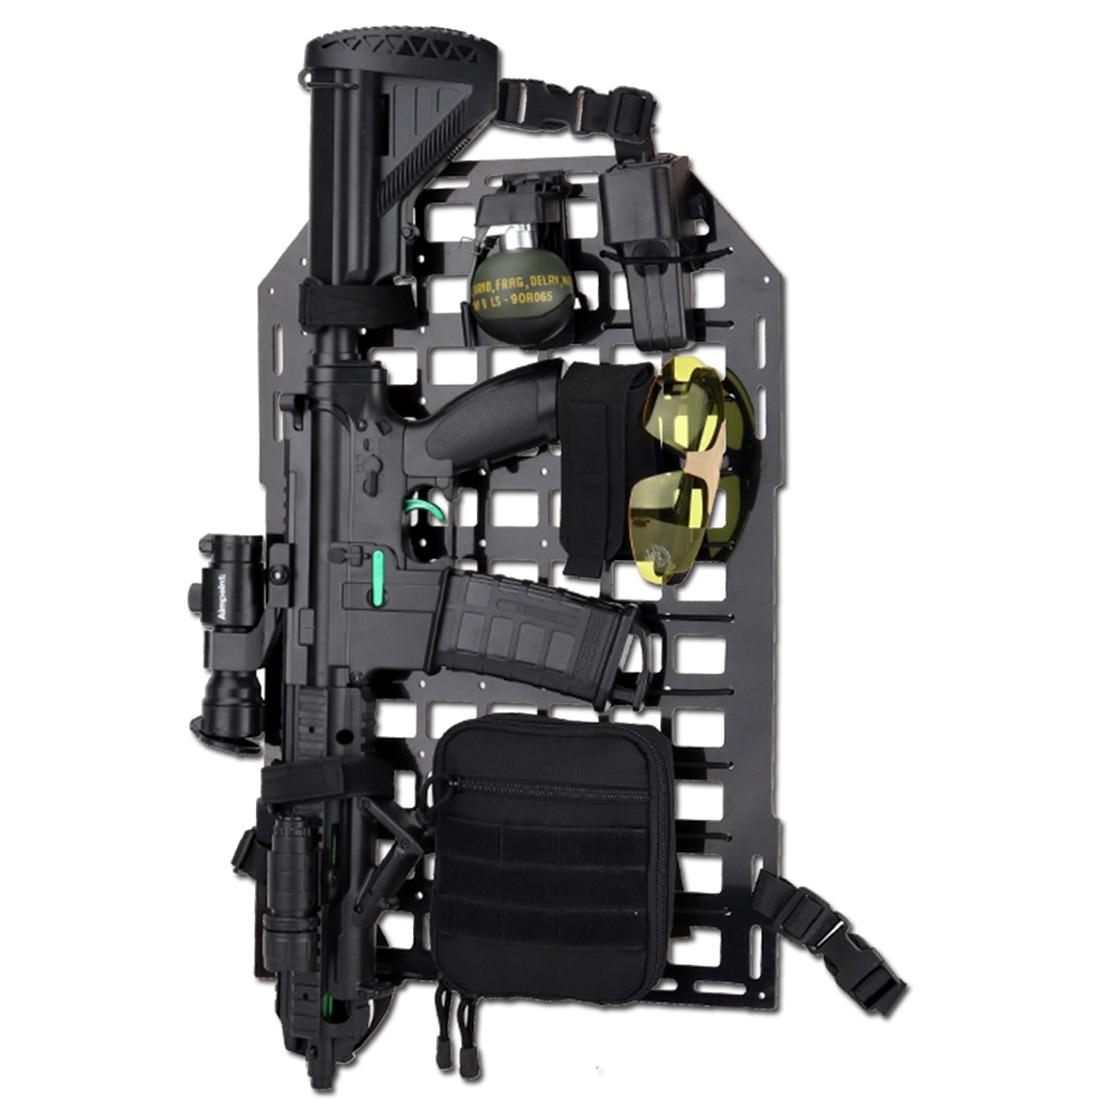 MODIKER WST Tactical Insert Panel Car Seat Back Organizer Tactical Seatback Equipment Outdoor- Black